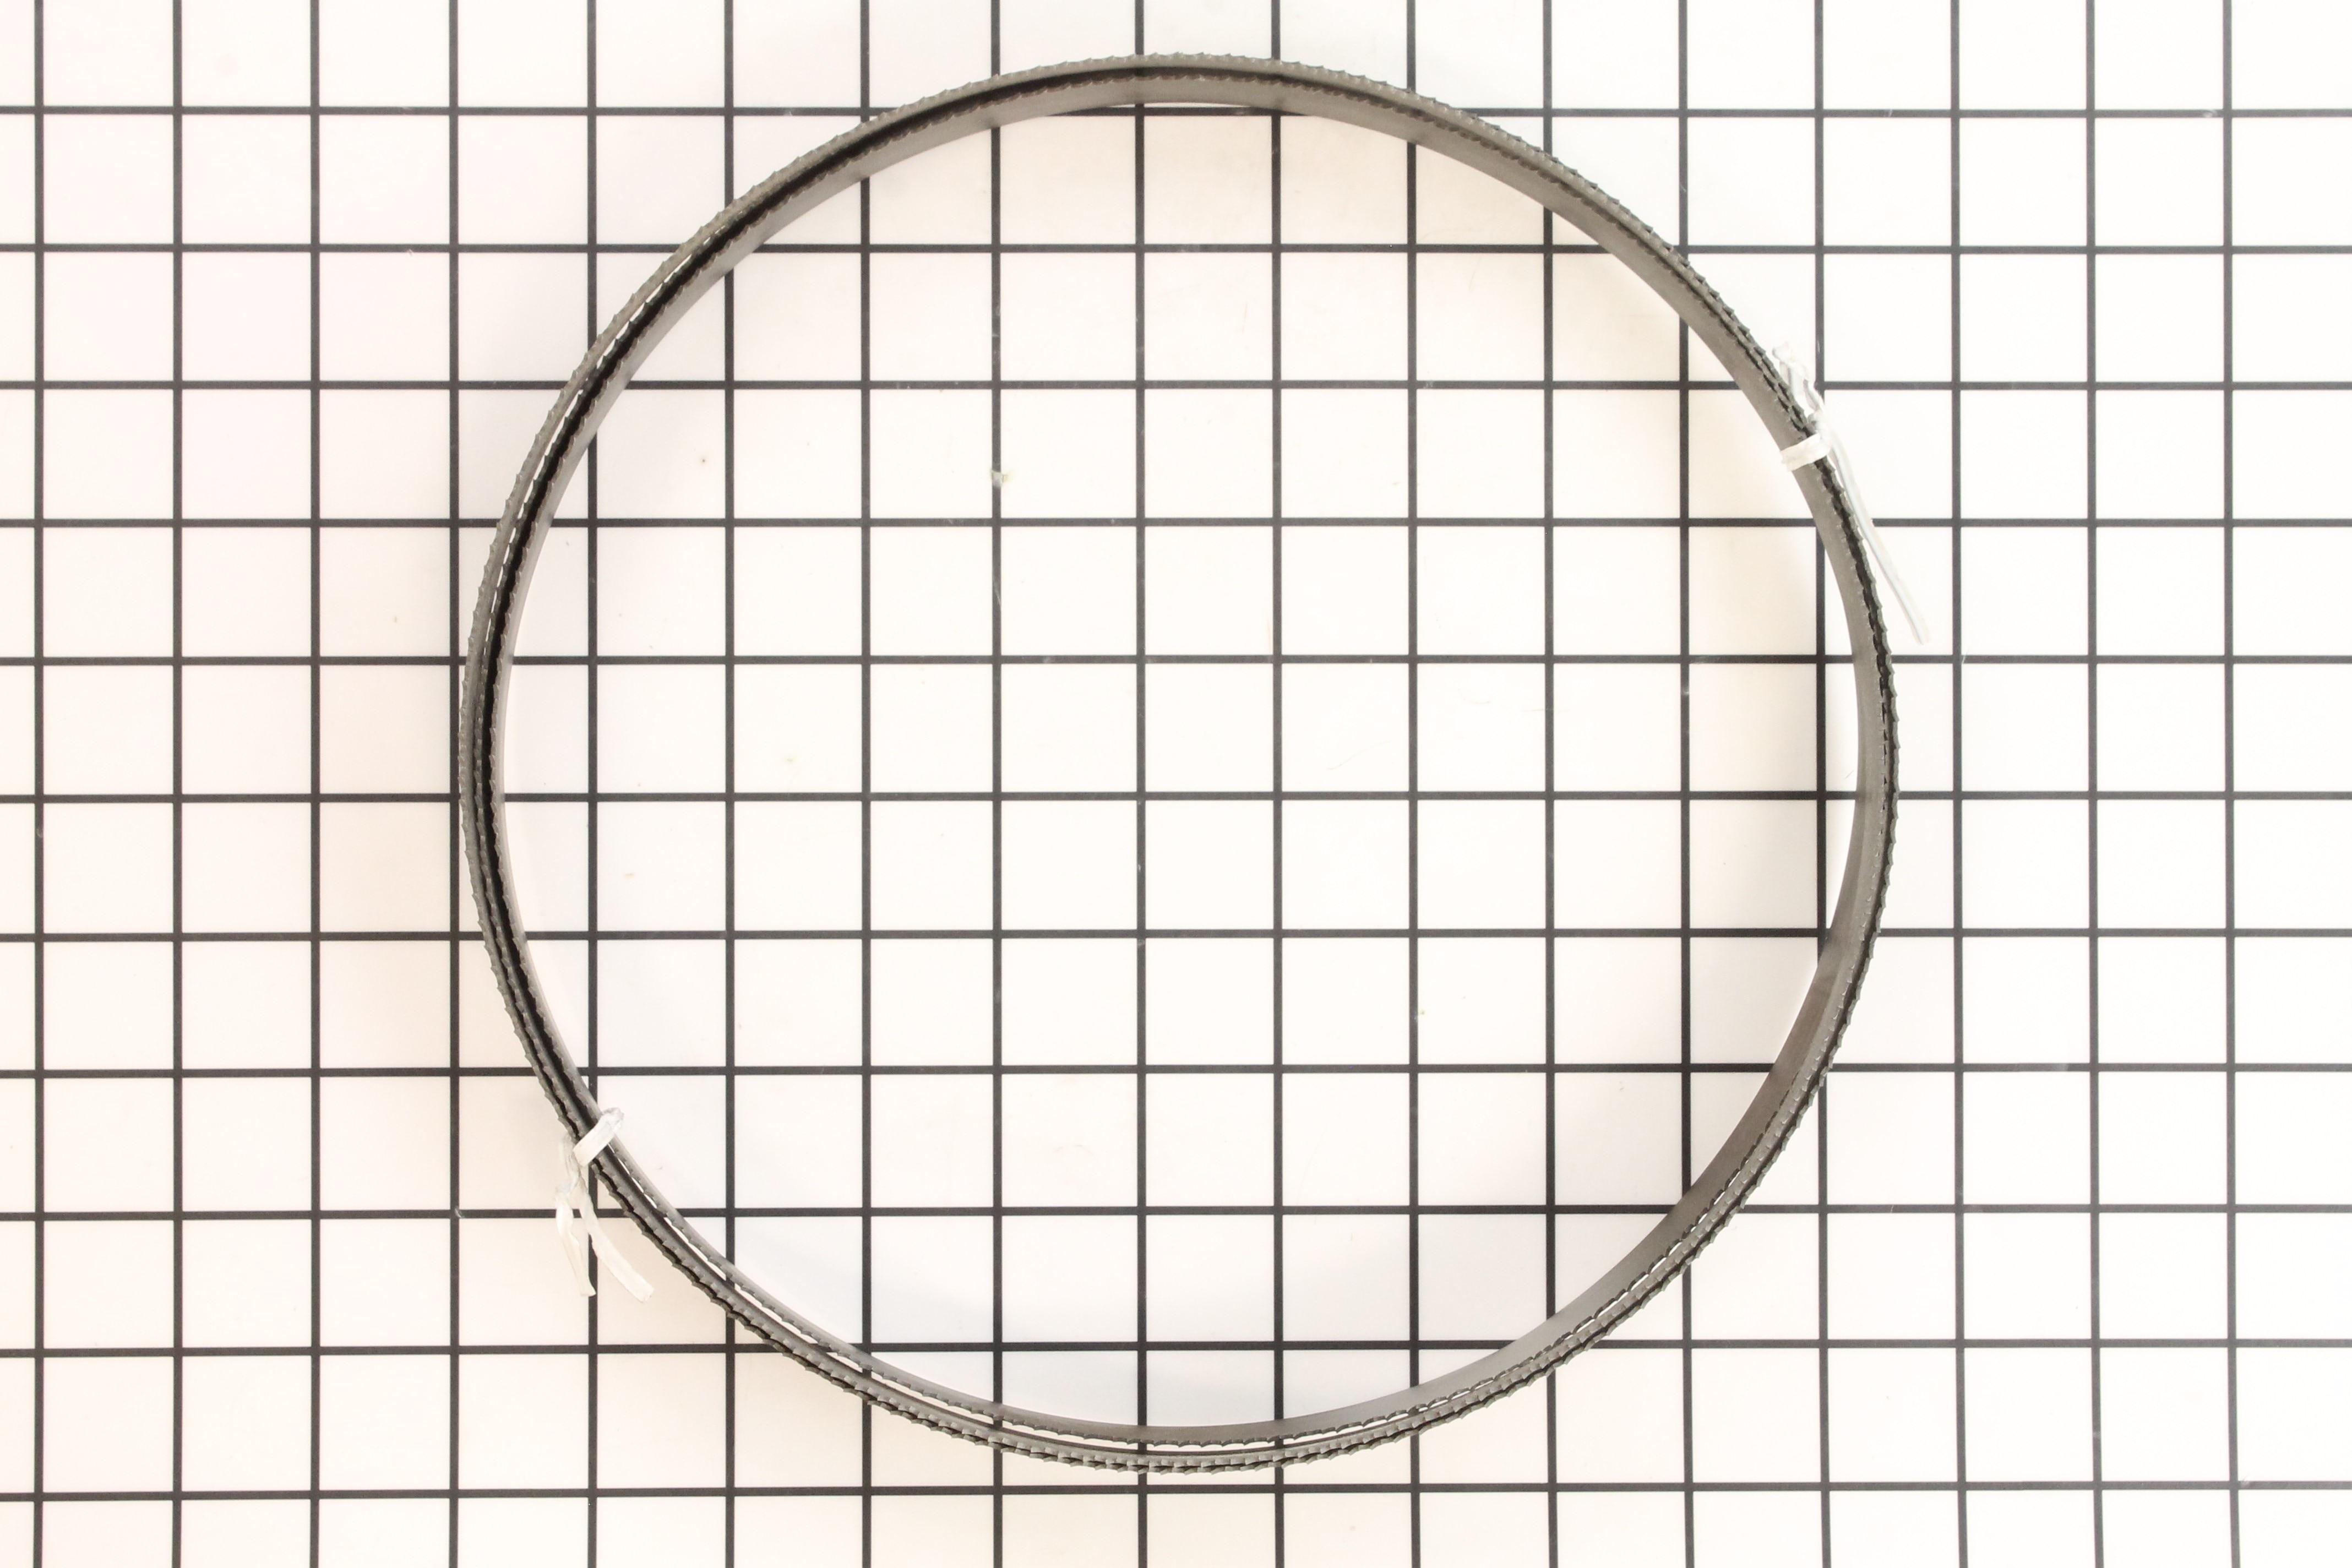 "Bi-Metal Bandsaw Blade 3/4"" x .035"" x 93"" x 10-14VT For HVBS-7MW, J-3410, HVBS-710G/S, HBS-812G"